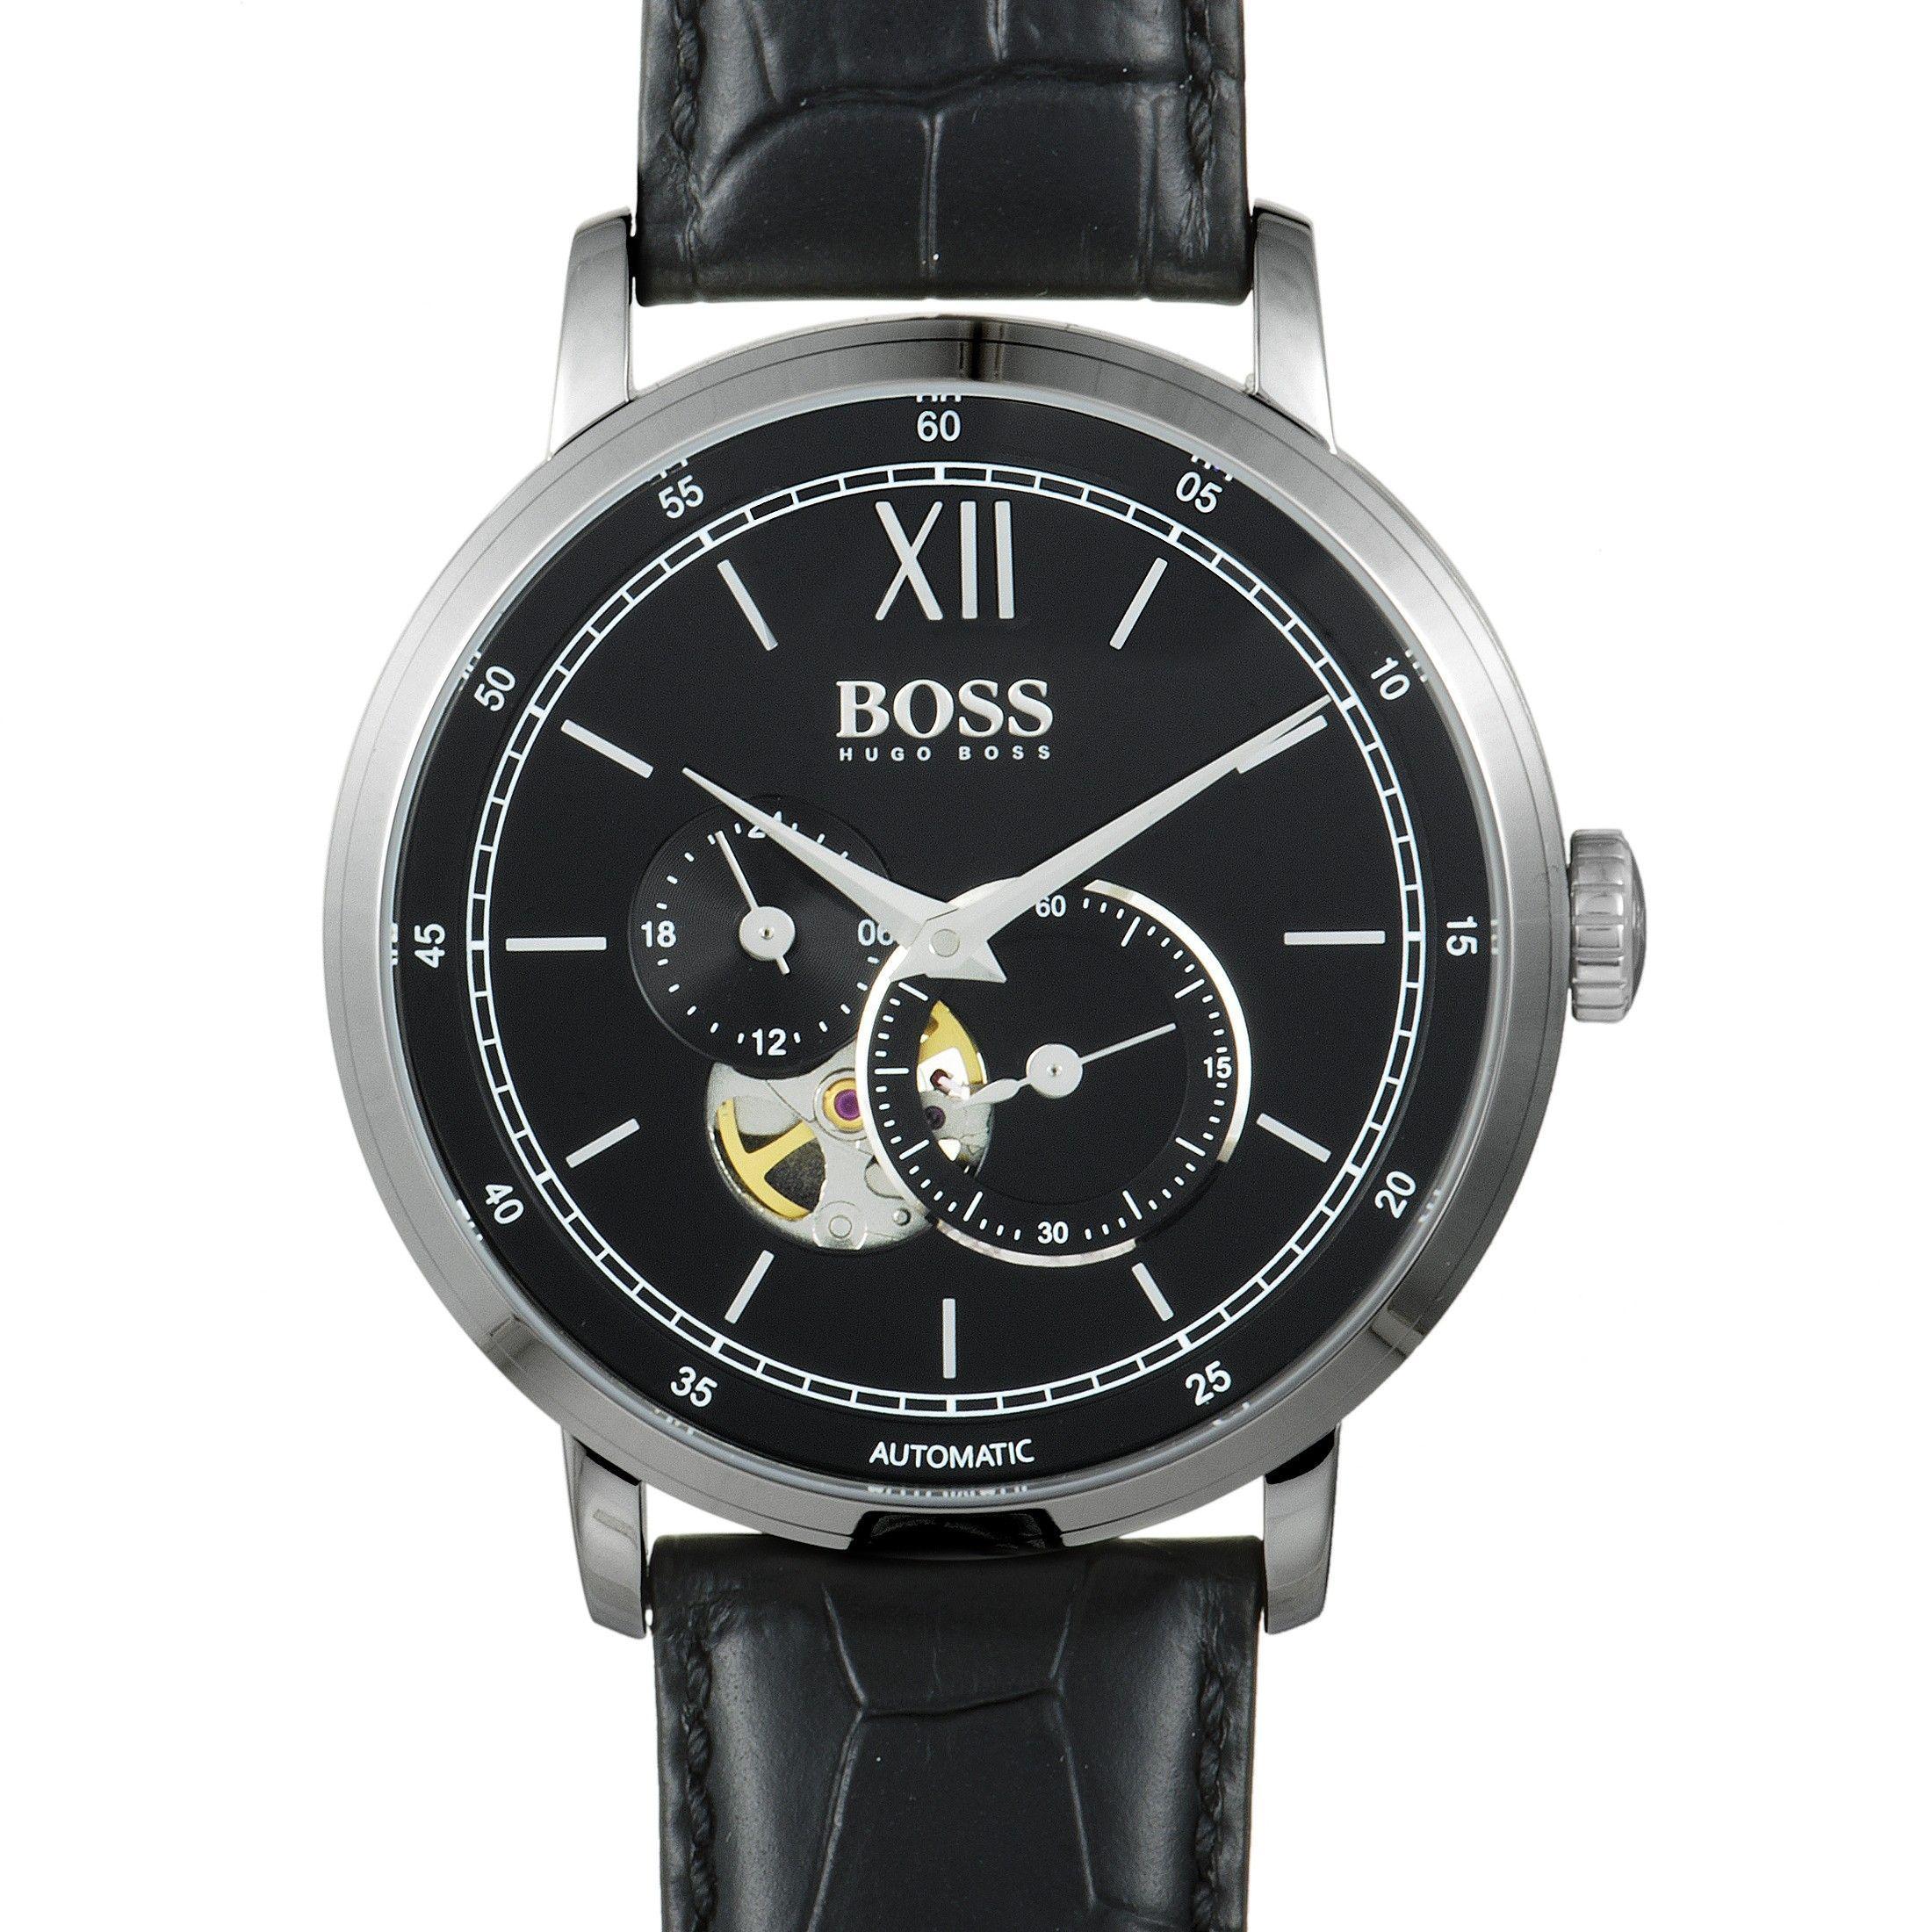 0e73a0932 Hugo Boss Signature Men's Watch Black 1513504 | Luxury Bazaar |  www.luxurybazaar.com